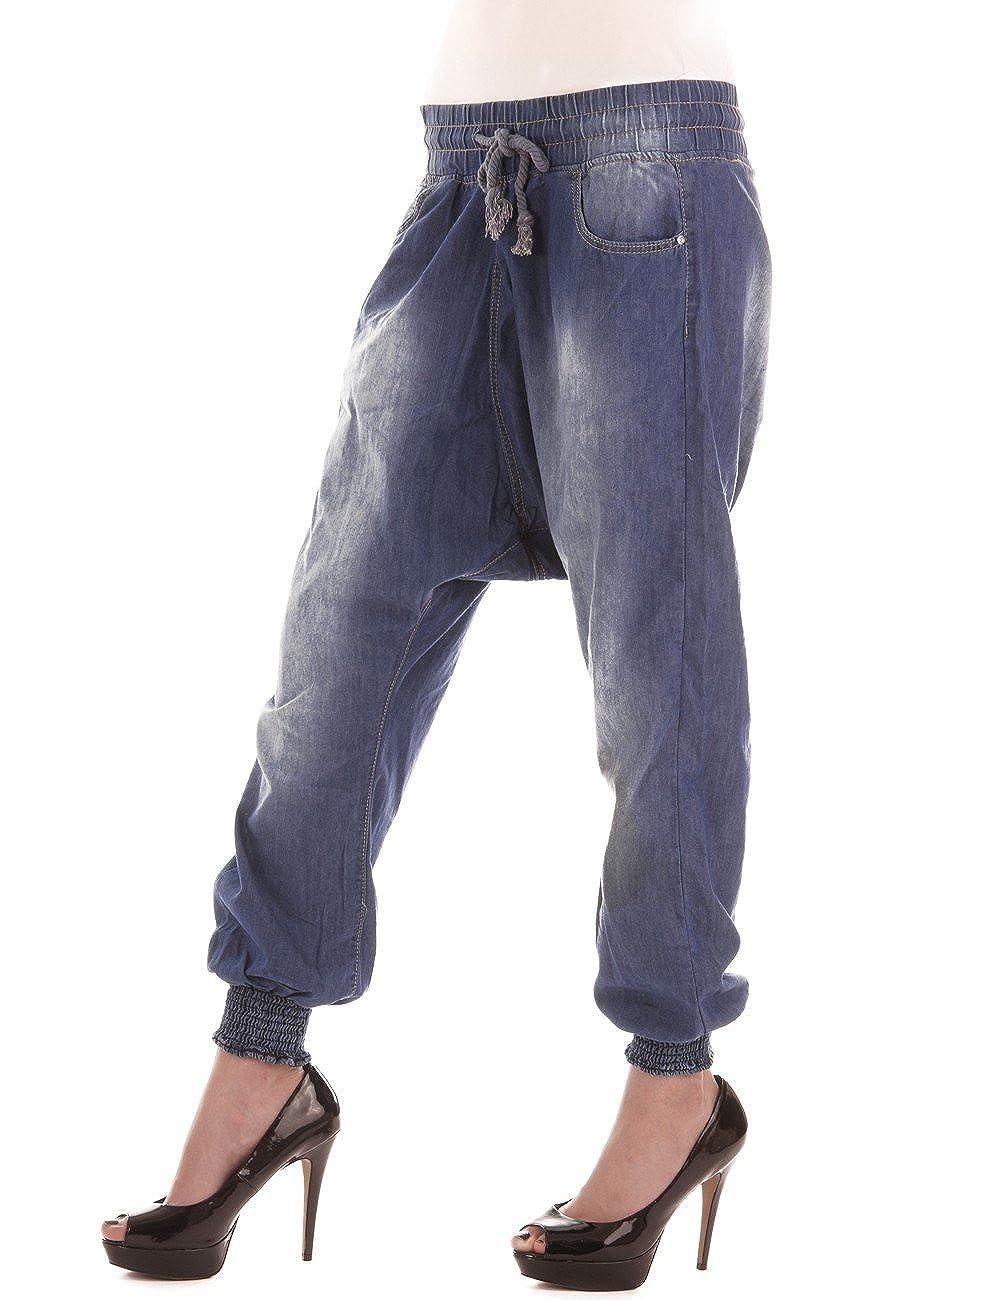 BALINGI Damen Pump Jeans BA10489, Größe:XXL;Farbe:blau